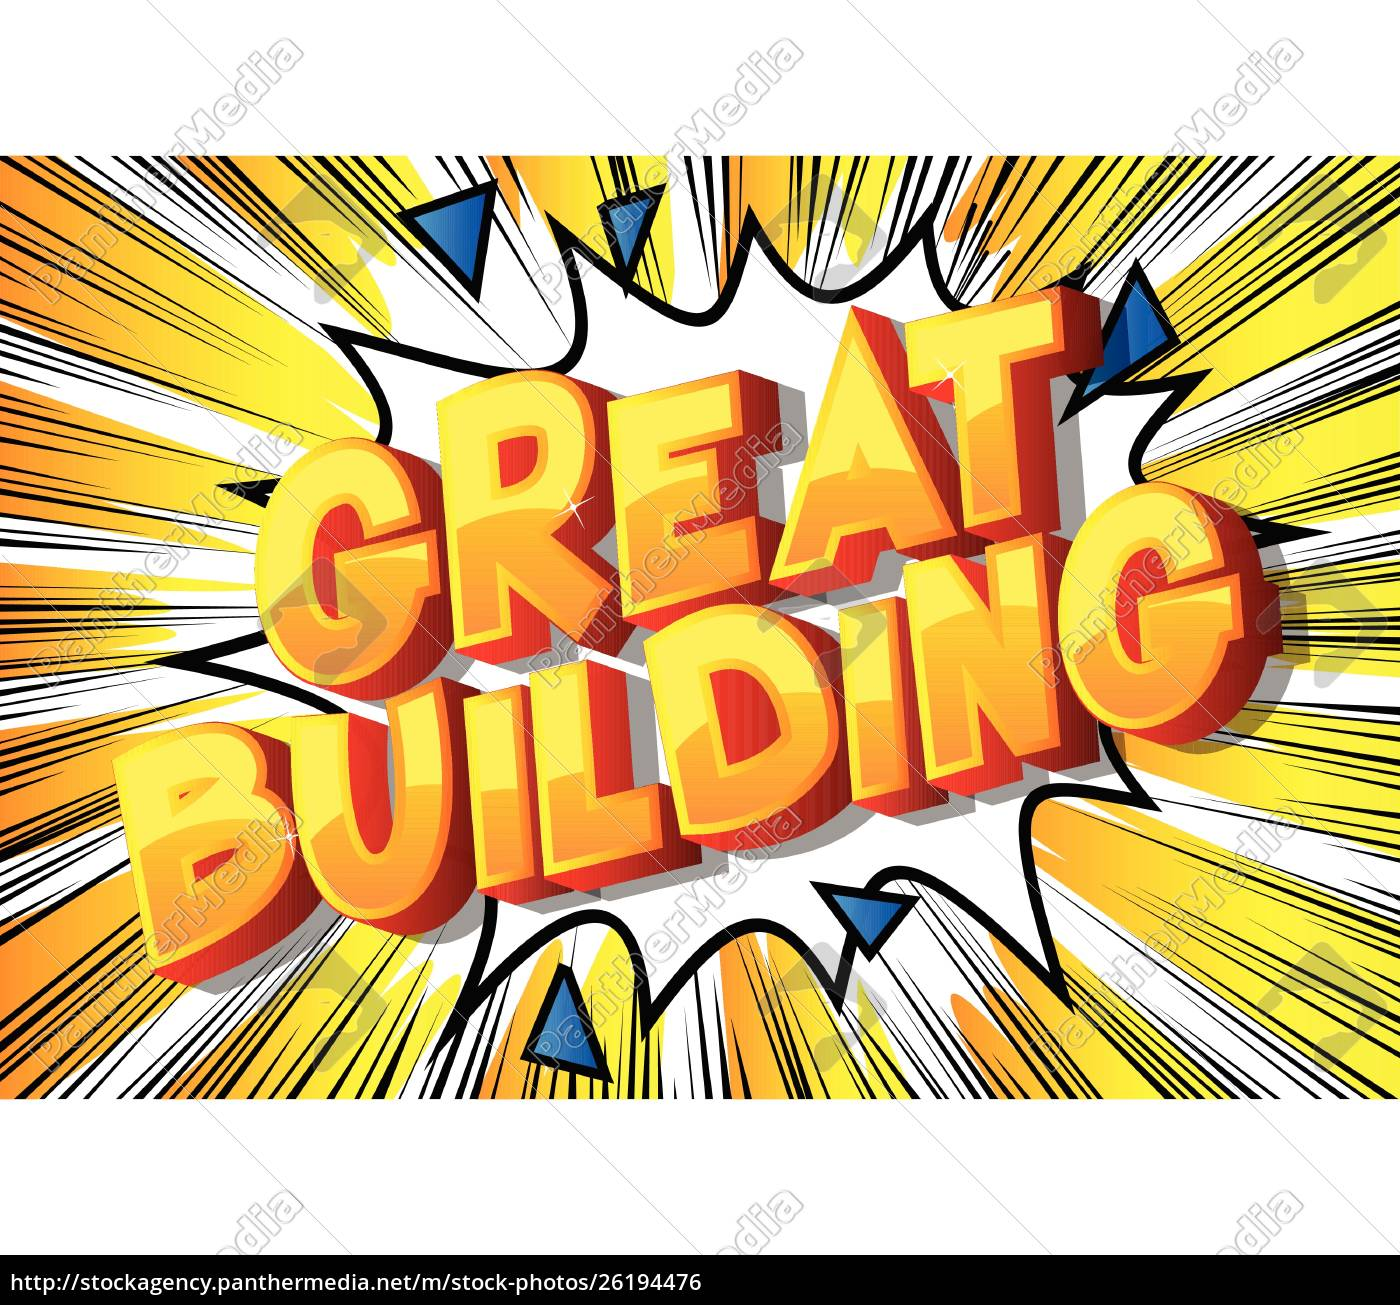 great, building-comic-buch-stil, wörter. - 26194476